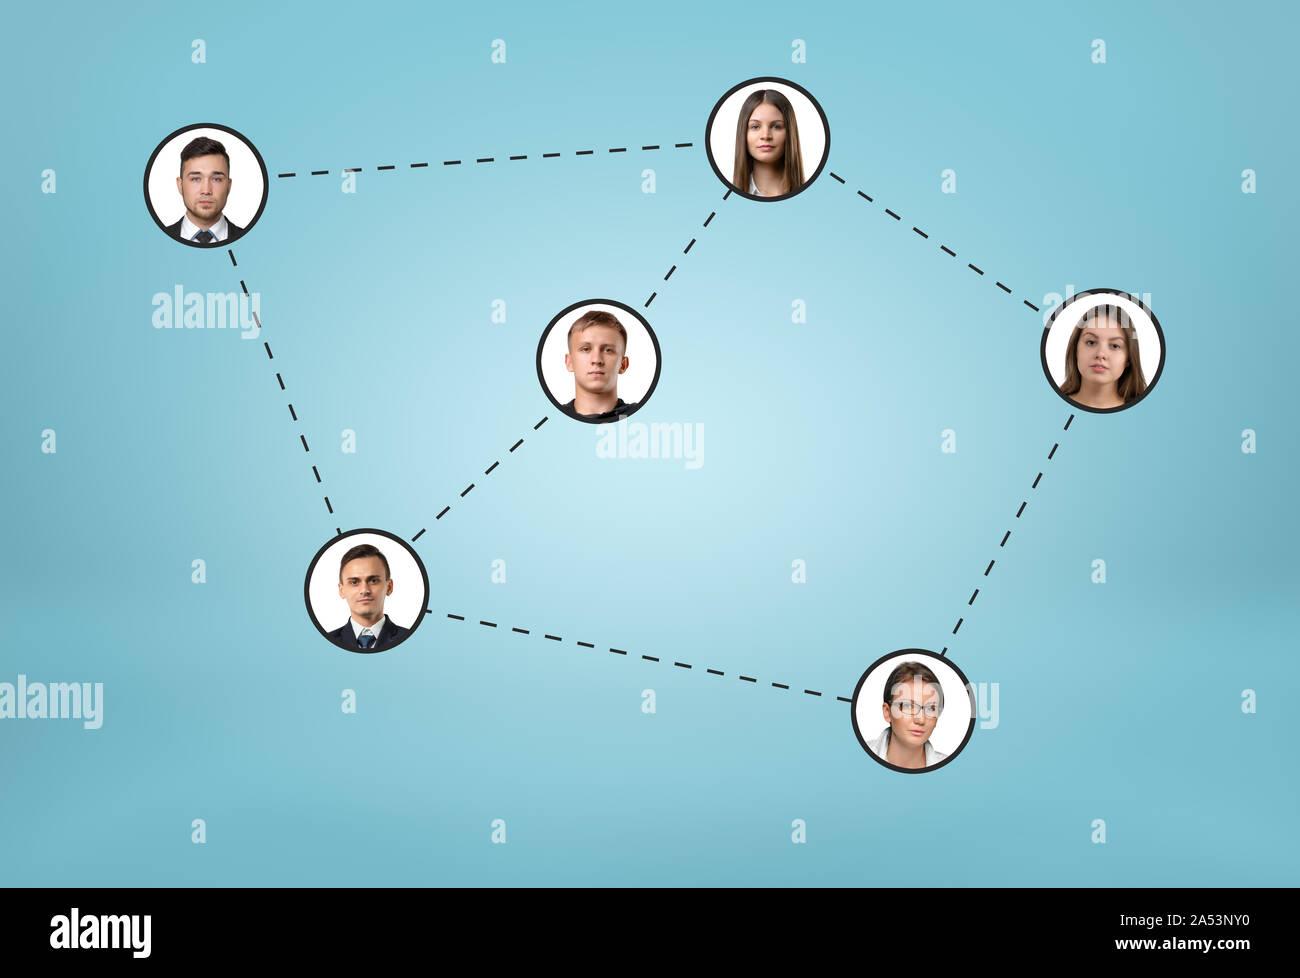 Iconos de redes sociales conectadas por líneas punteadas sobre fondo azul. Foto de stock